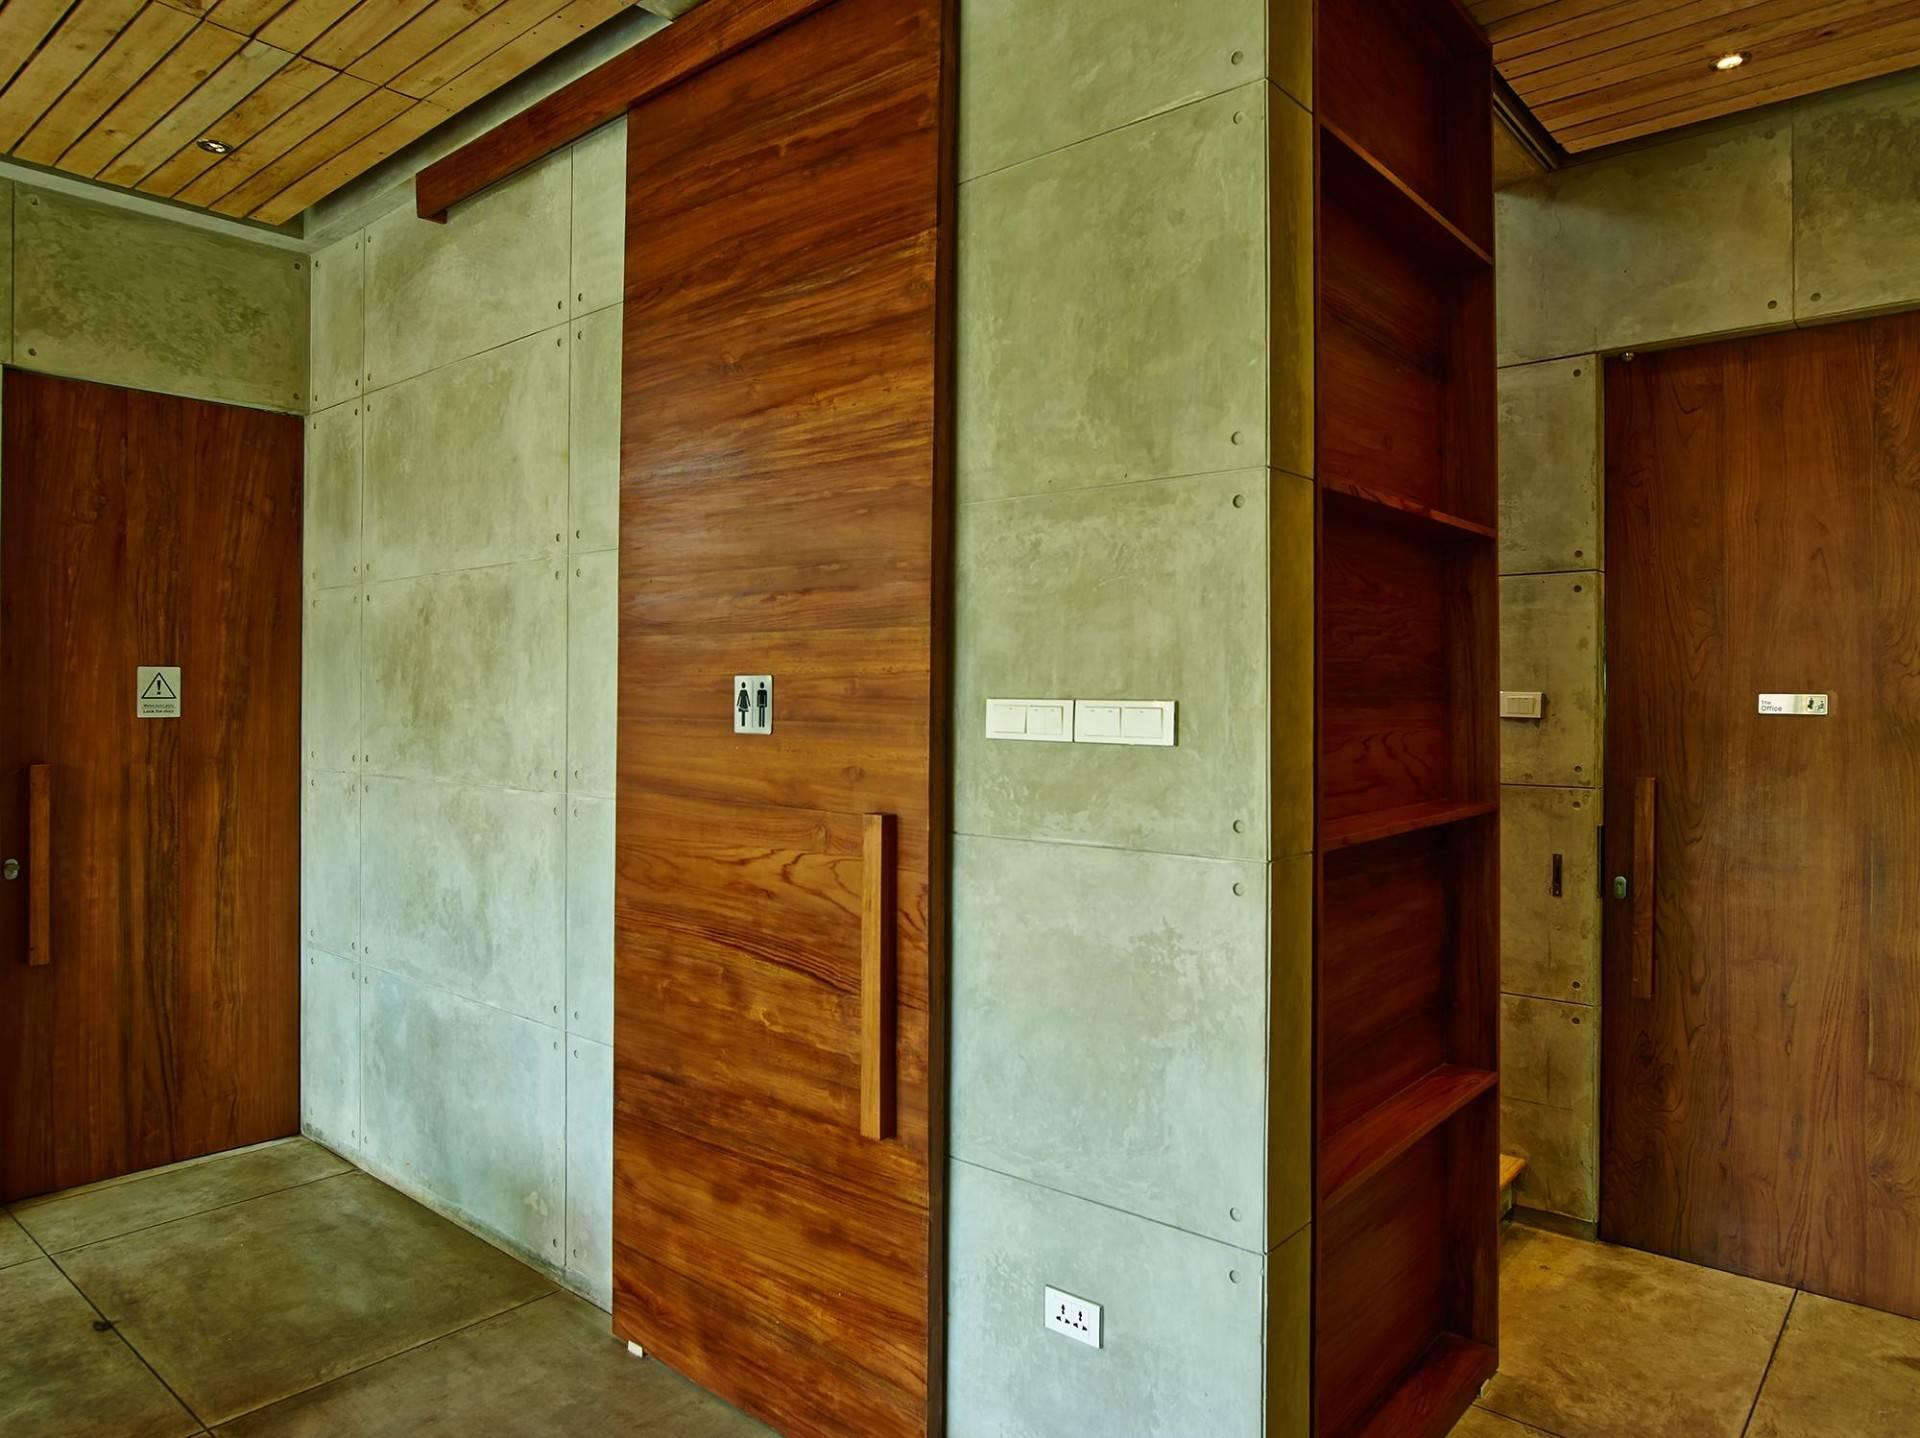 Raw Architecture Bare Minimalist Jakarta, Indonesia Jakarta, Indonesia Powder Room   1544